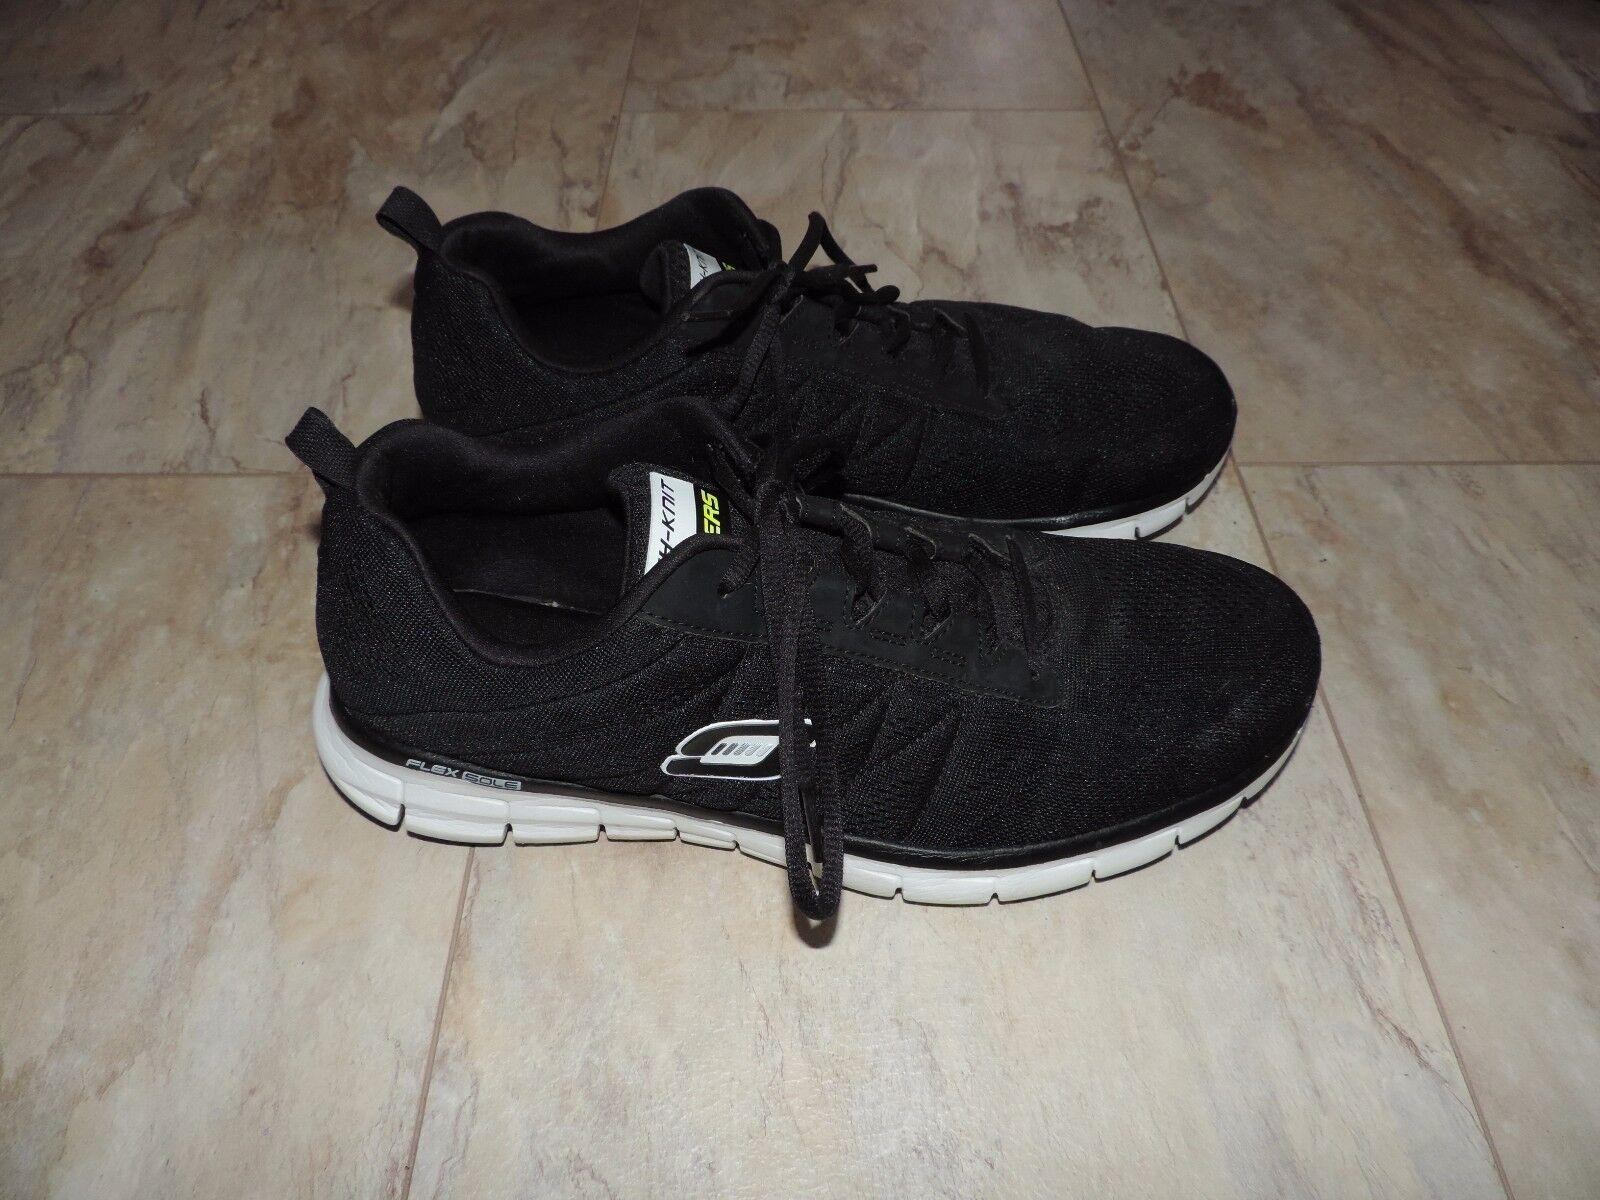 Skechers Herren Schuhe 45 Sneaker Sportschuhe, Gr.10 Eur. 45 Schuhe 17f659